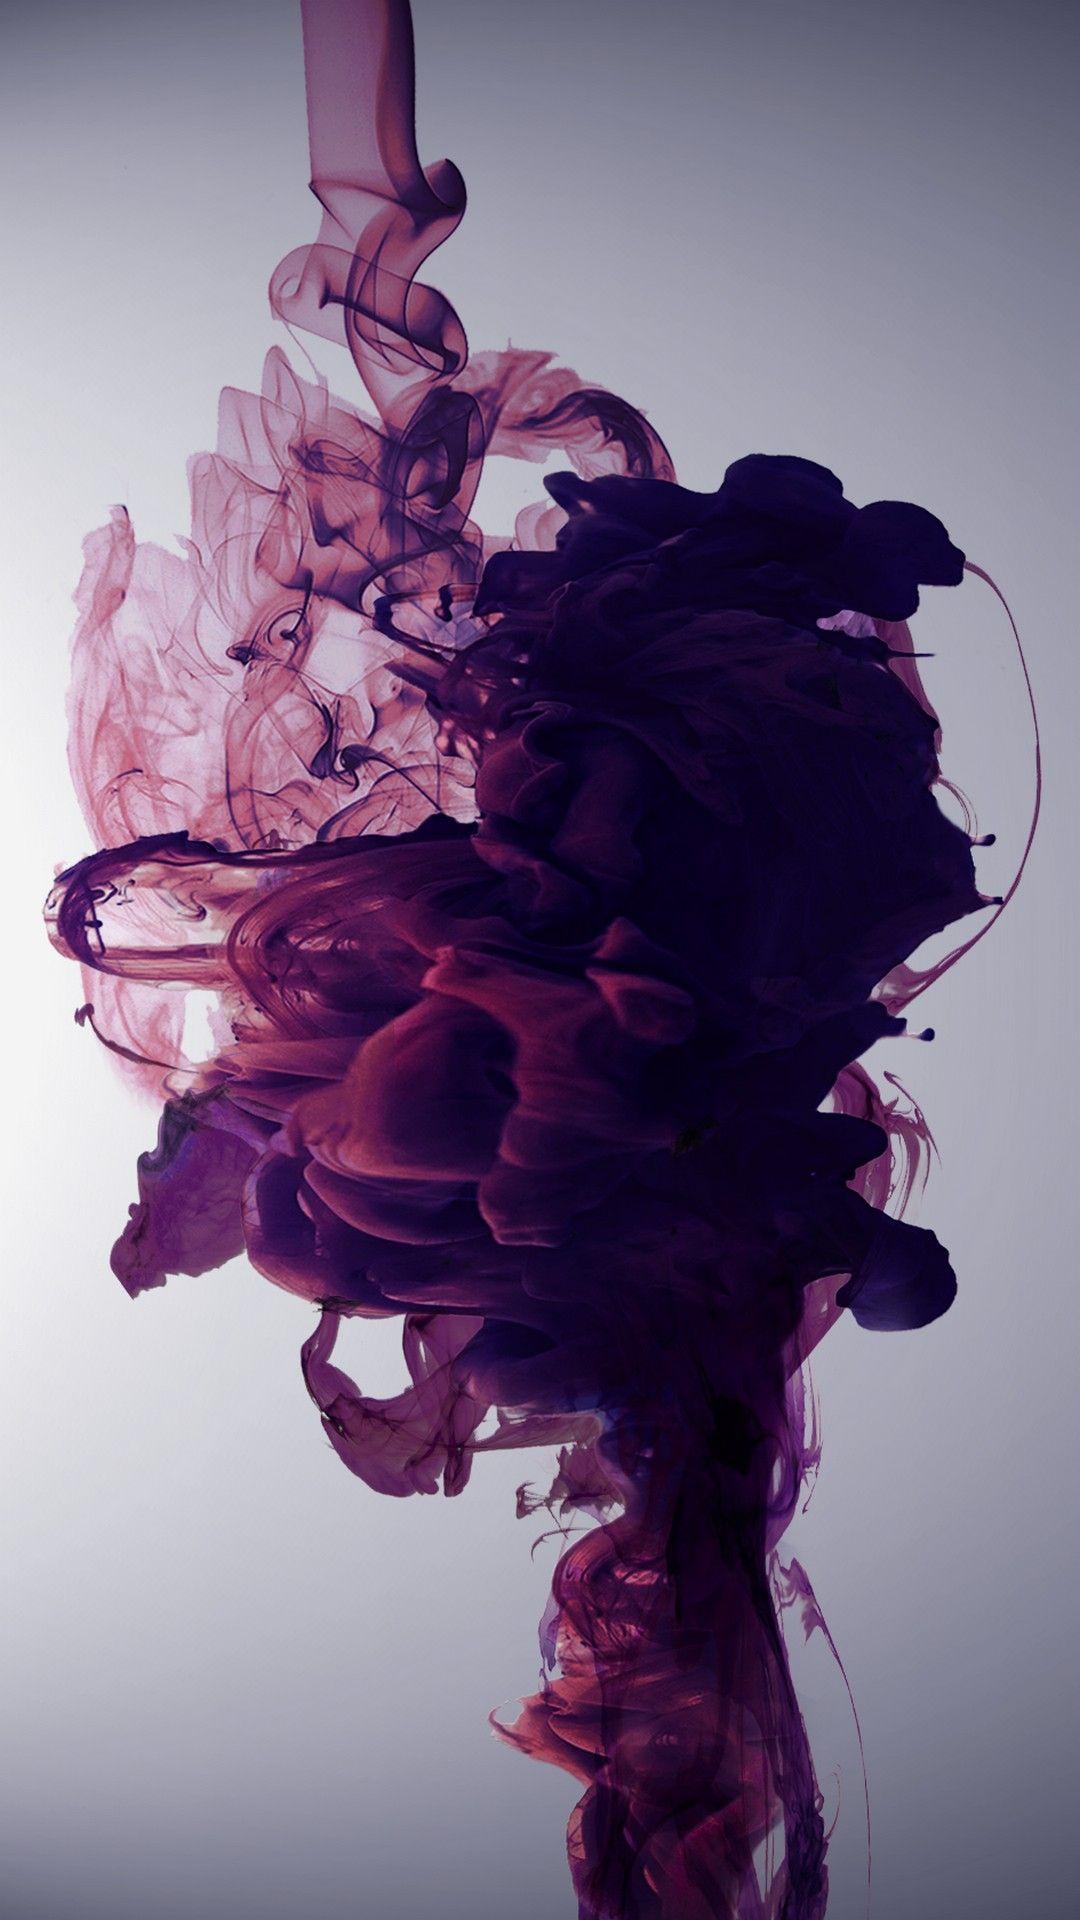 HD Purple Liquid Wallpaper For iPhone   iPhoneWallpapers   Best iphone wallpapers, Lock screen ...